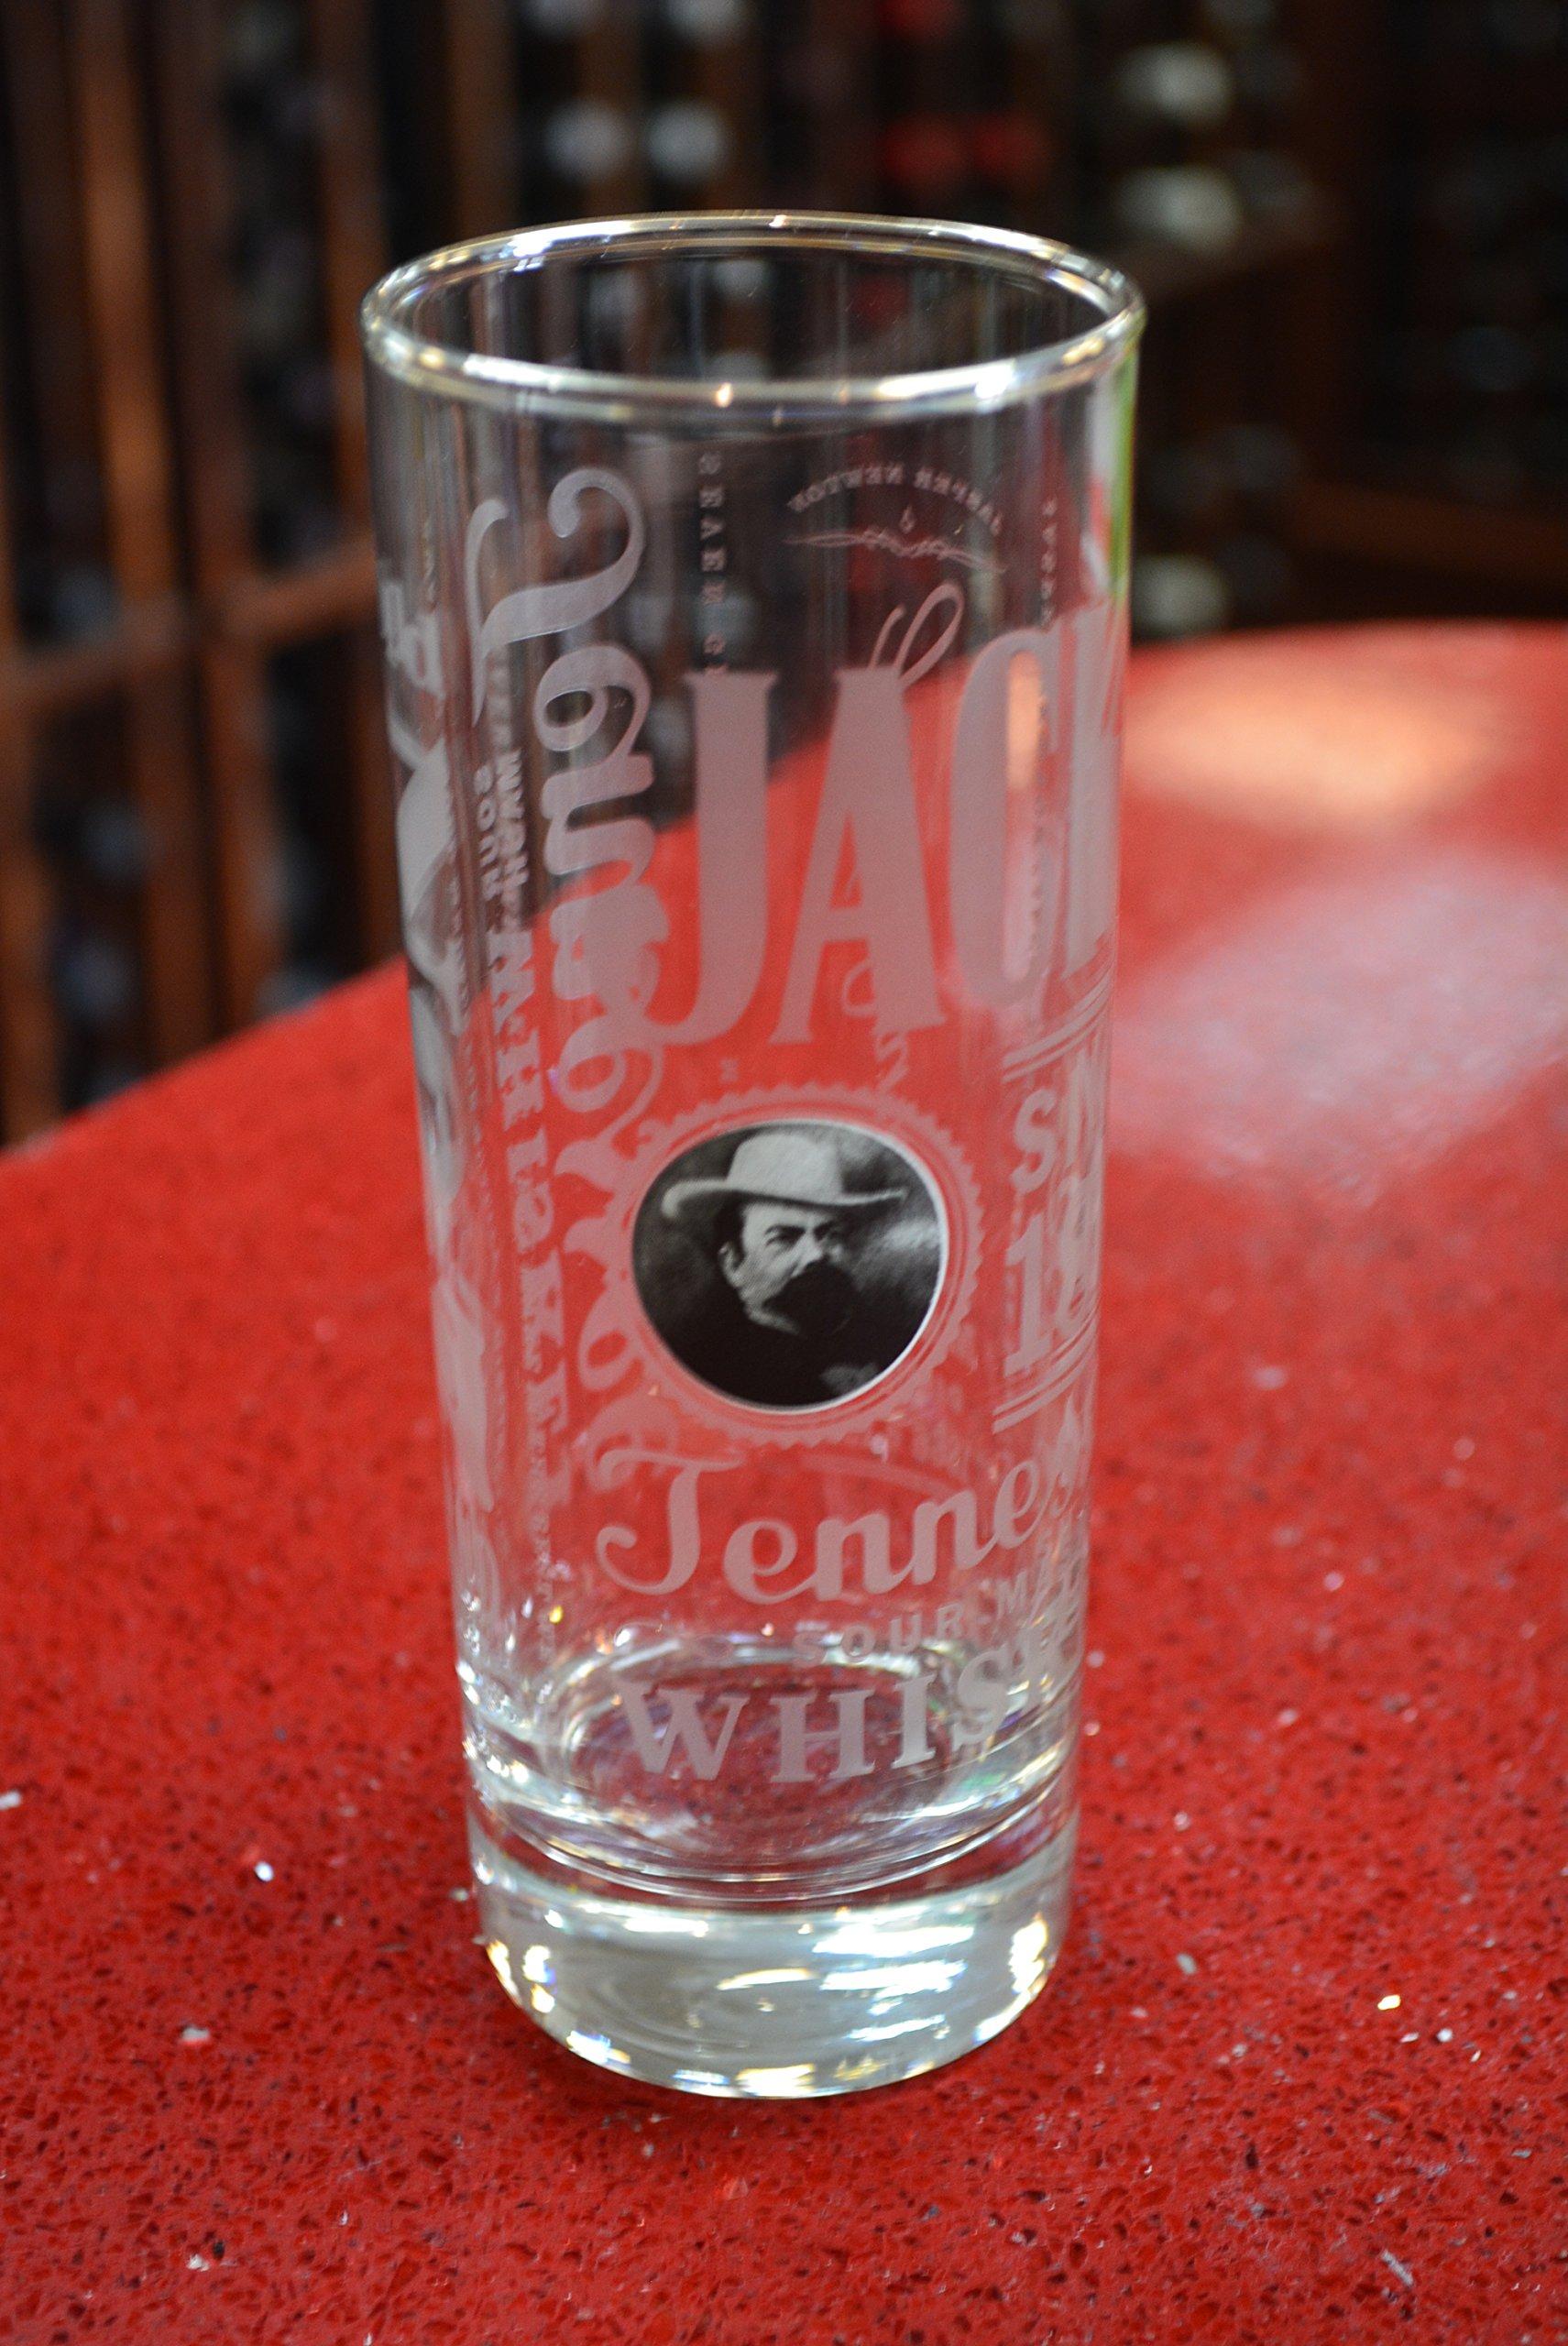 Jack Daniel's Tennessee Sour Mash Whiskey Highball Glass